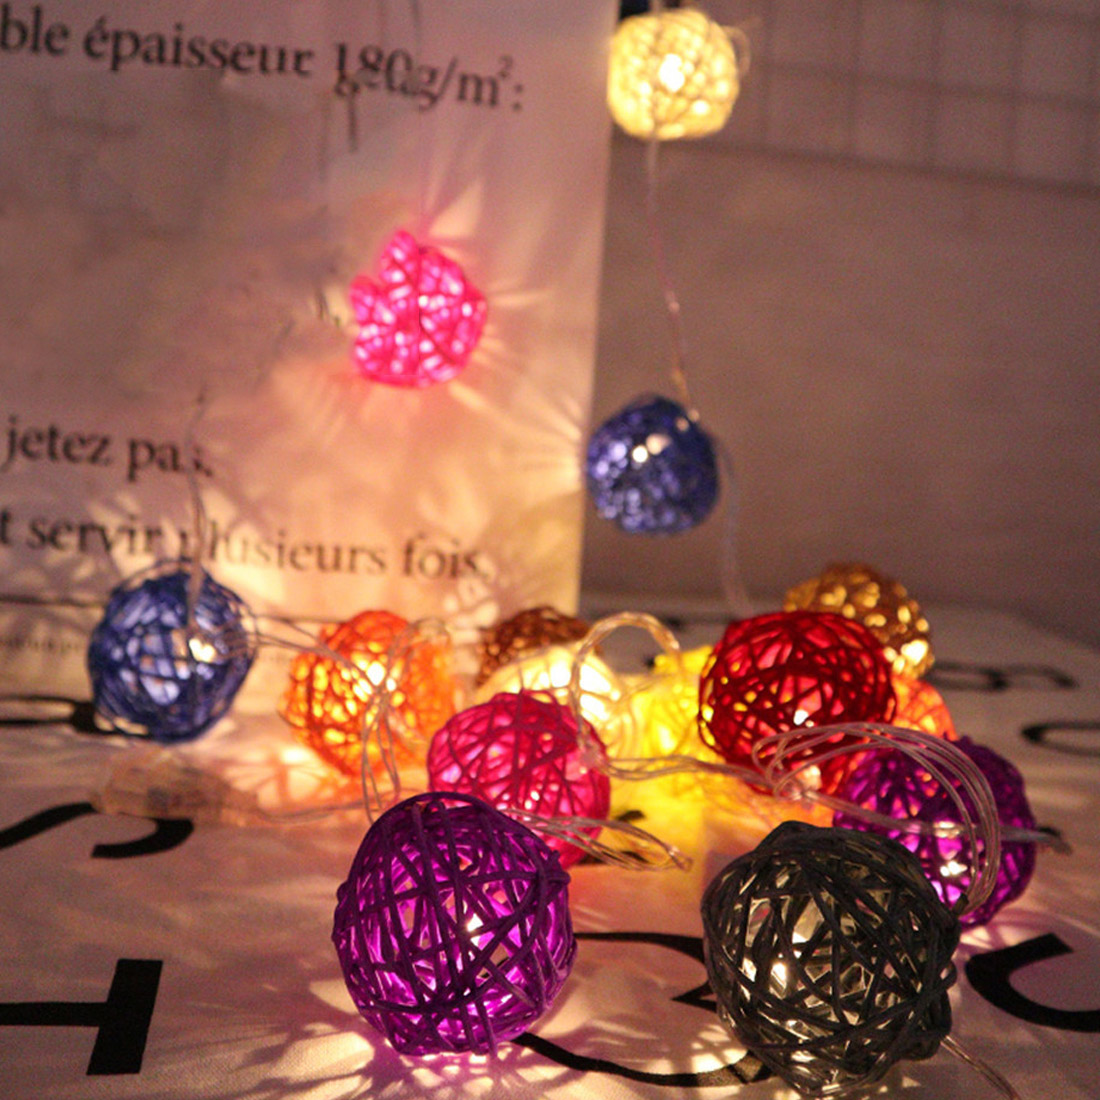 3m 20 Rattan Balls Lights Led String Fairy Holiday Christmas Lights Outdoor Decoration3m 20 Rattan Balls Lights Led String Fairy Holiday Christmas Lights Outdoor Decoration